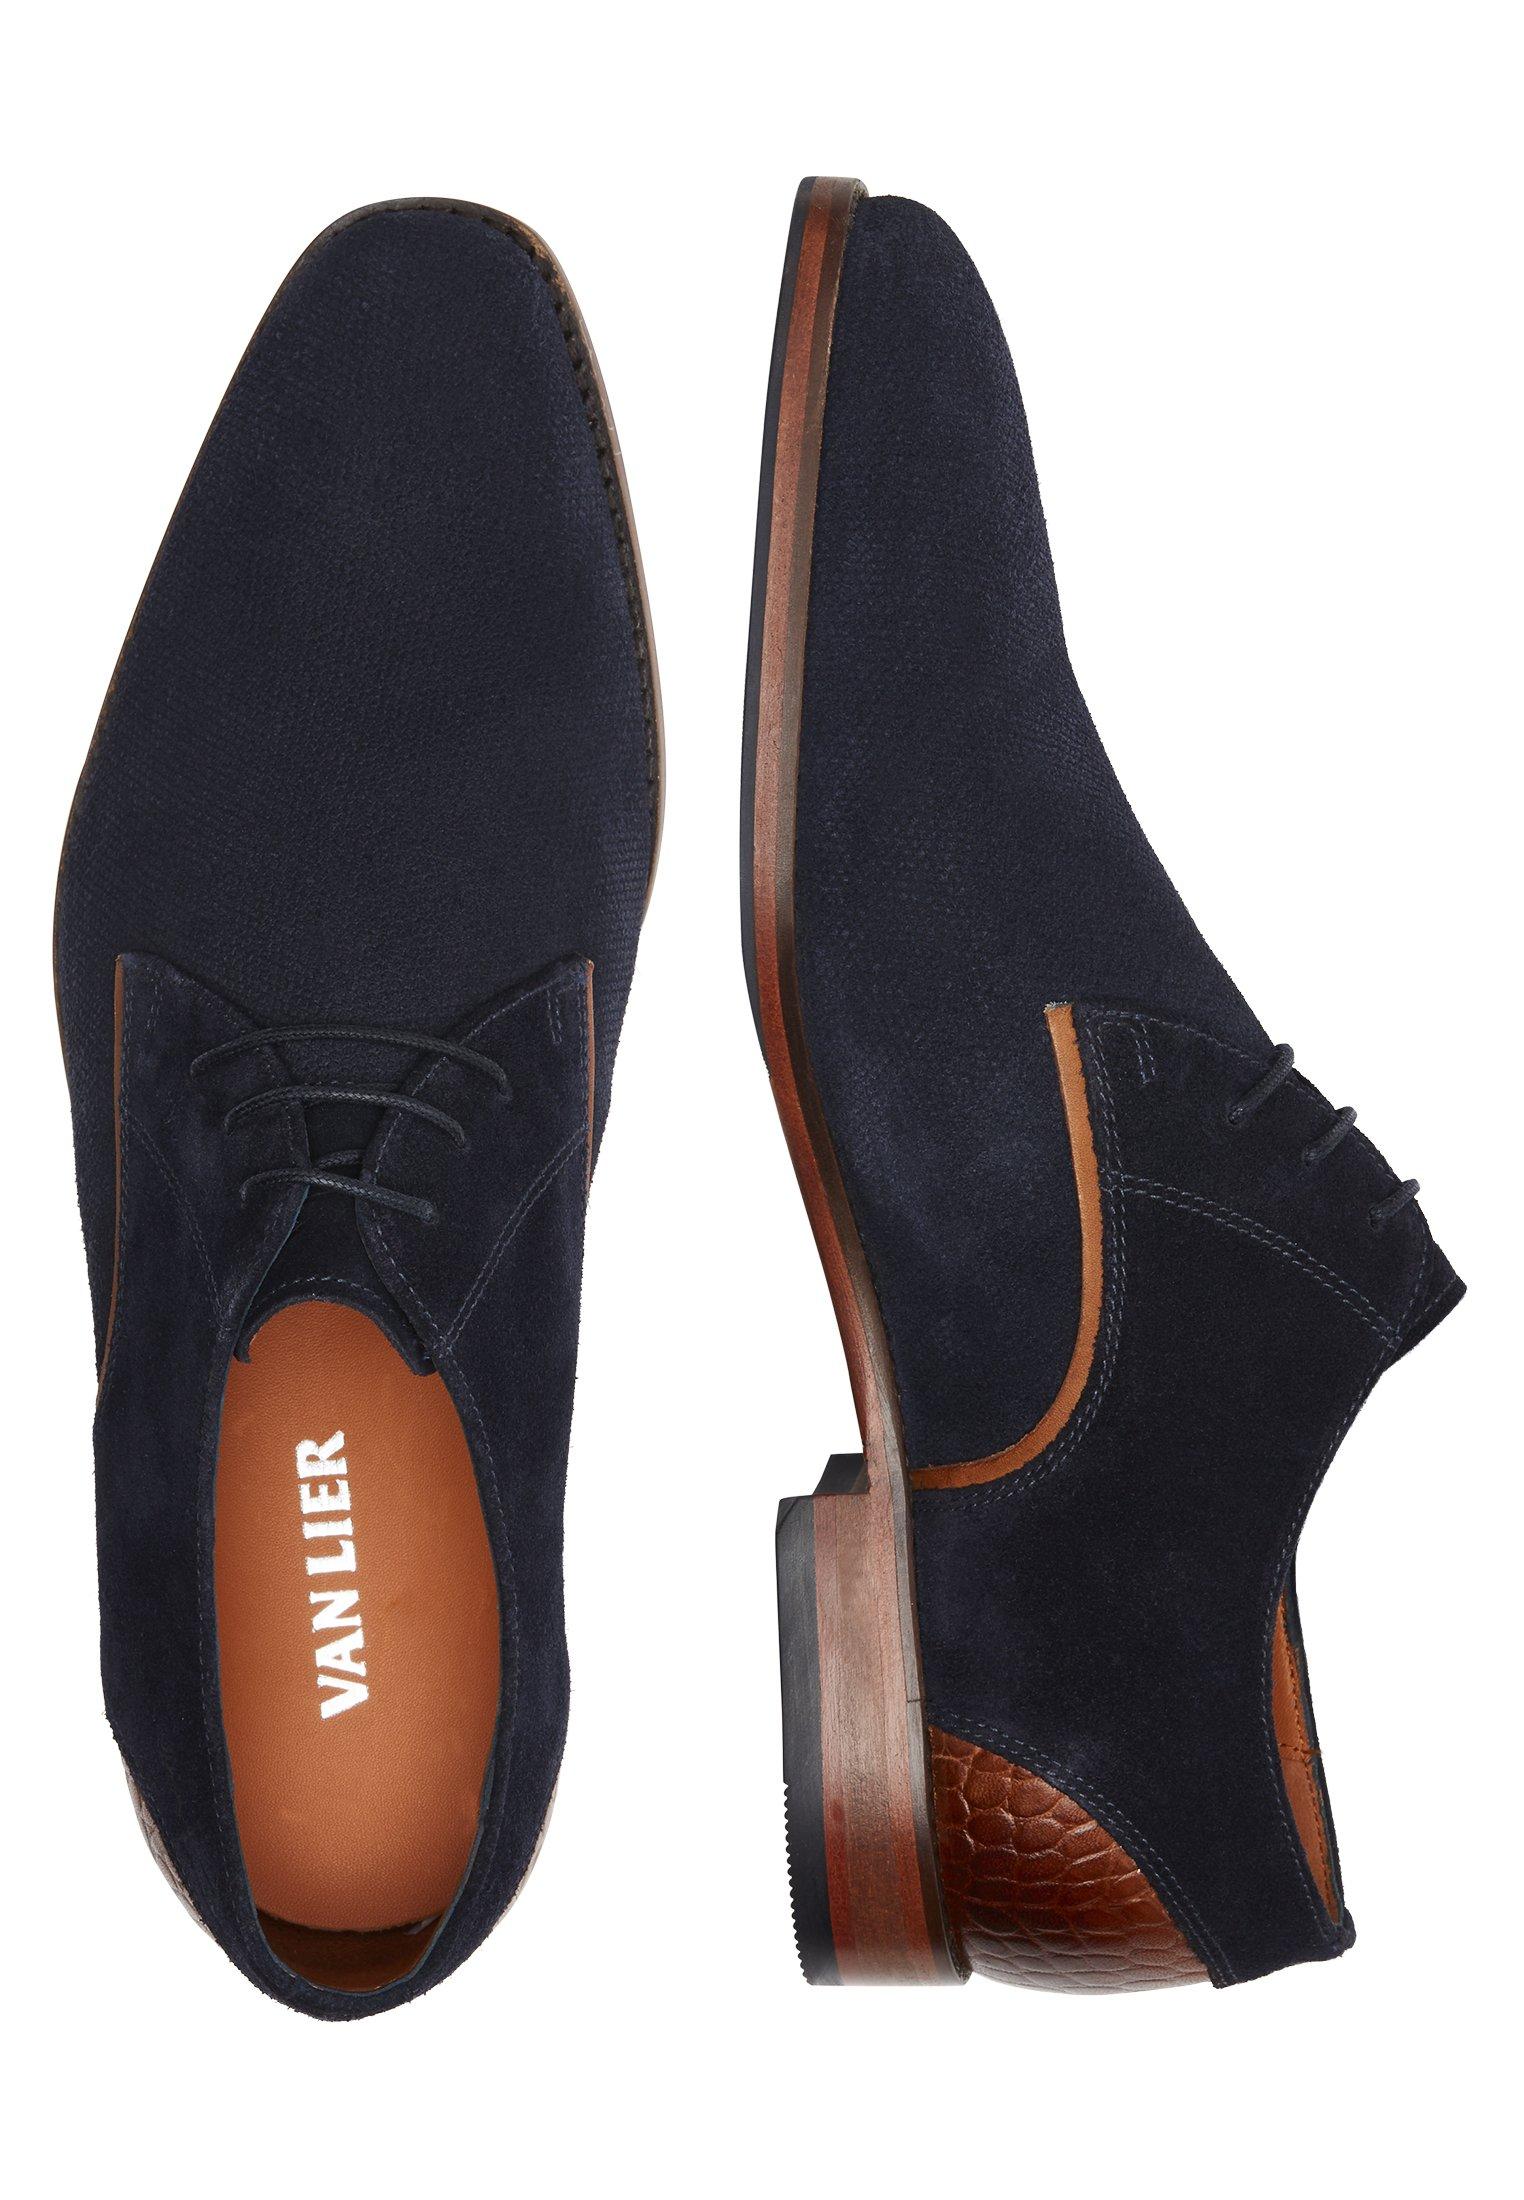 Van Lier Chaussures à lacets - zwart/noir - ZALANDO.BE